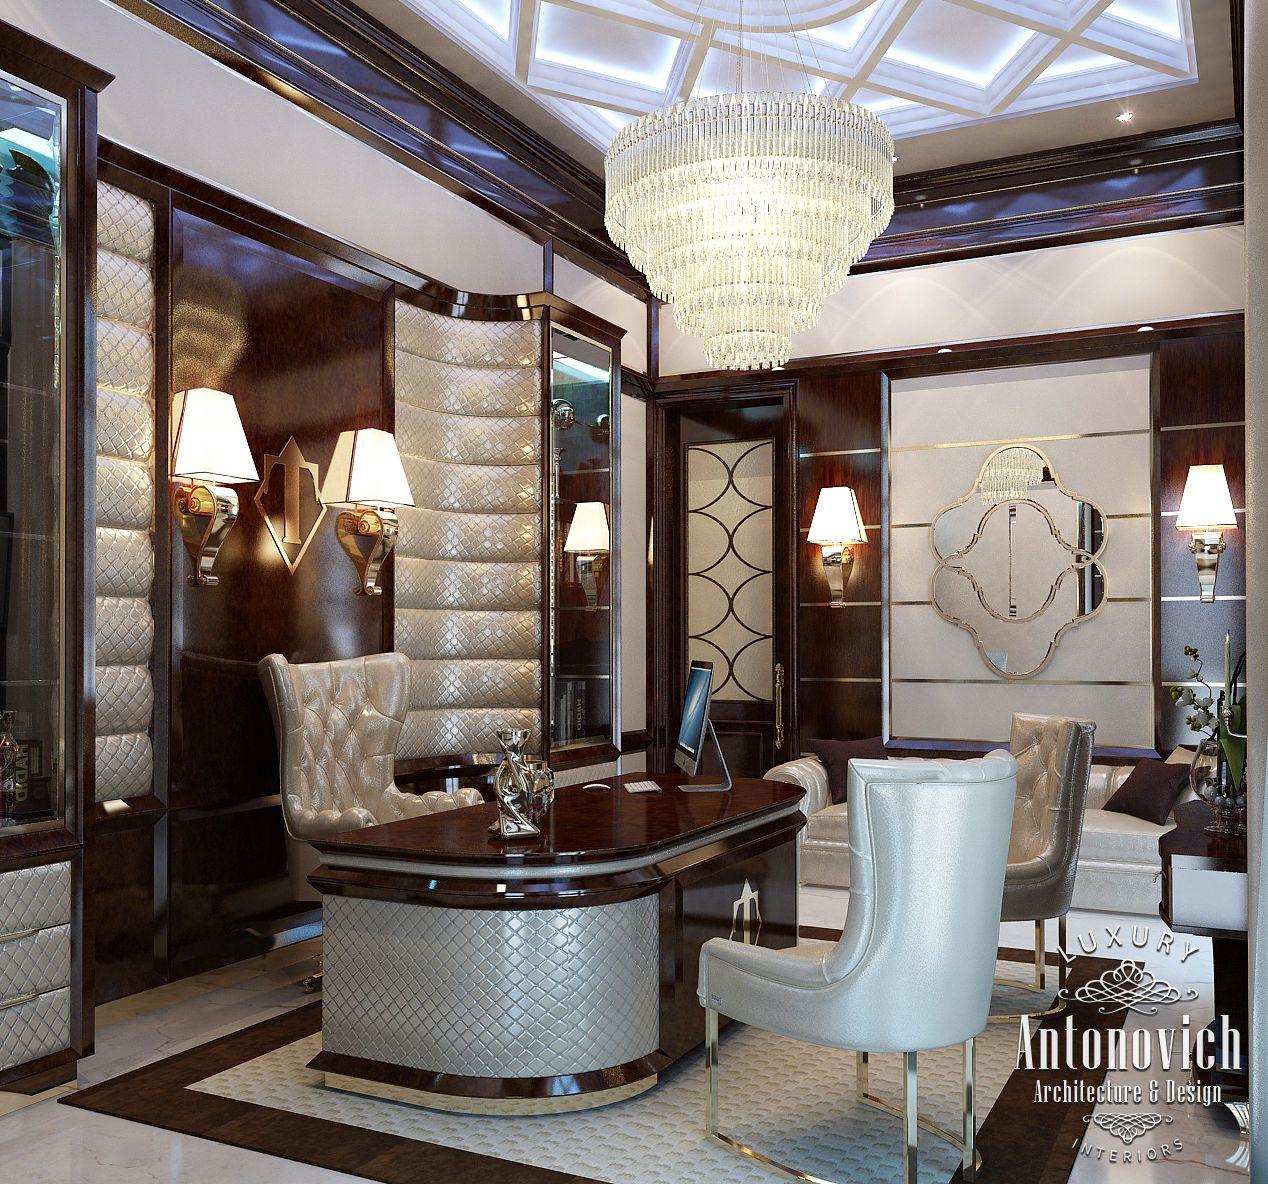 LUXURY ANTONOVICH DESIGN UAE: Office Interior From Luxury